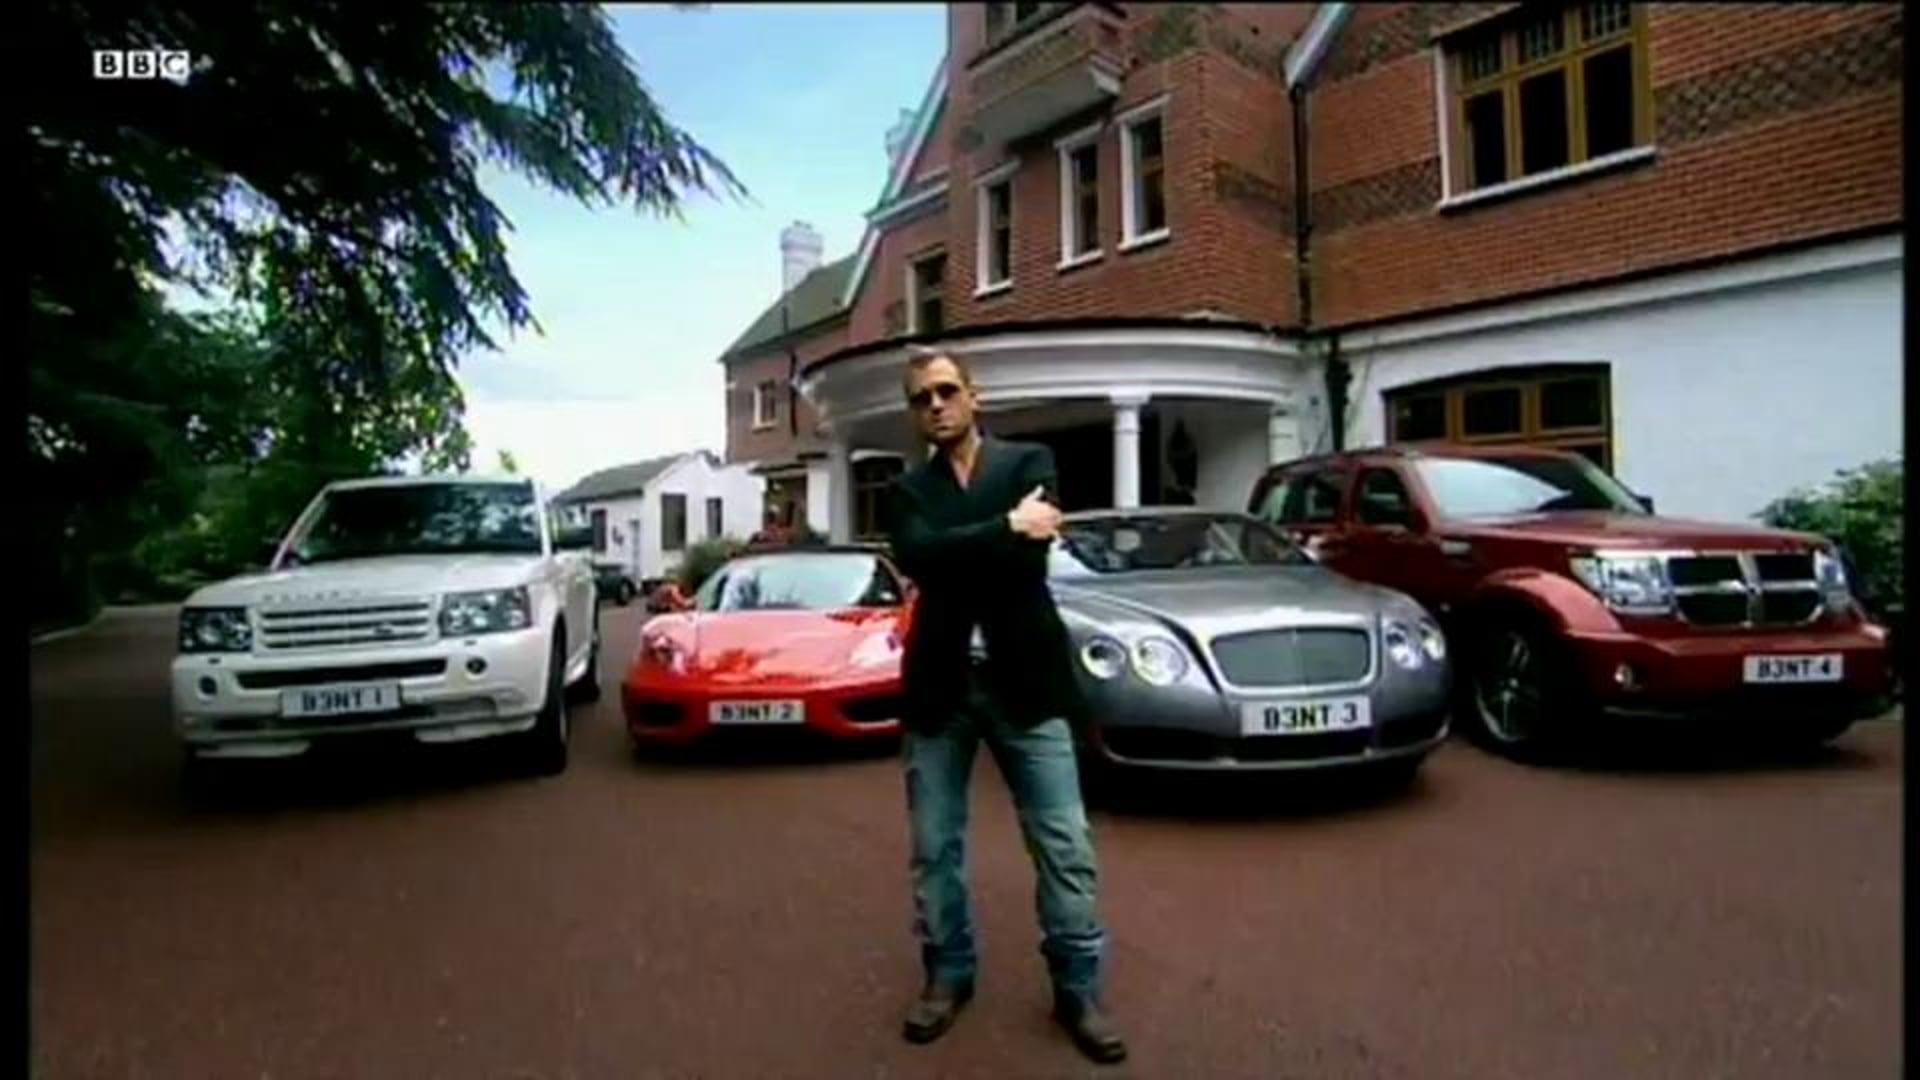 The Lee Nelson Show - BBC 3. 'Jason Bent'